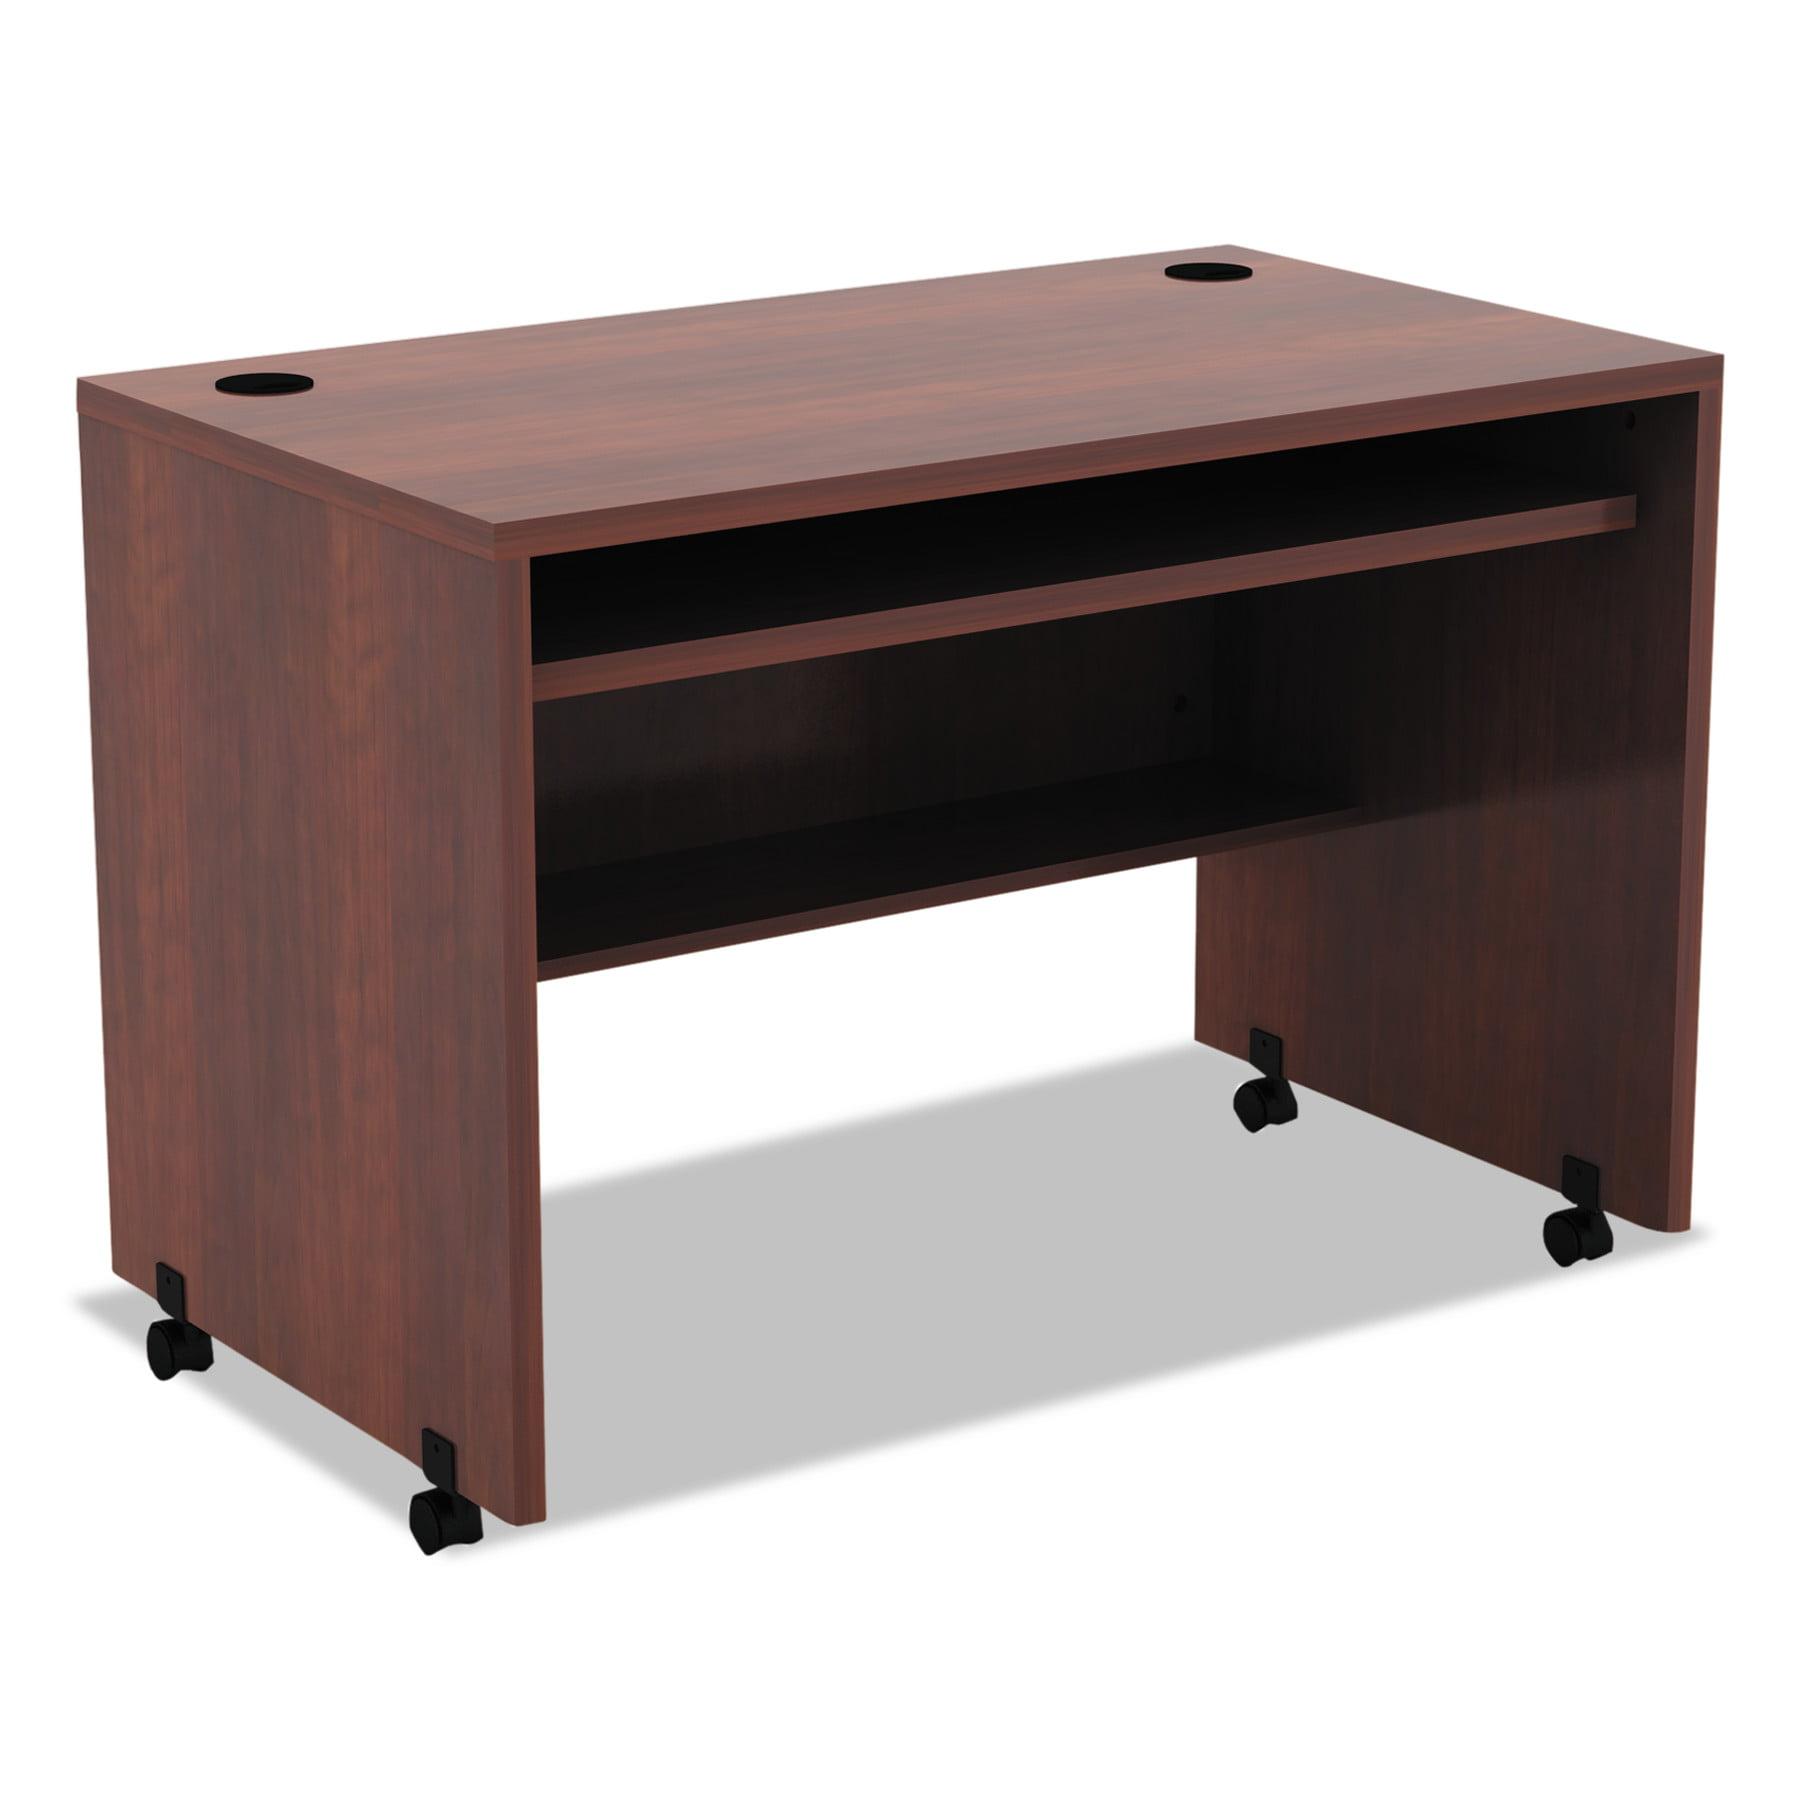 Alera Valencia Mobile Workstation Desk, 41 3/8 x 23 5/8 x 29 7/8, Med Cherry